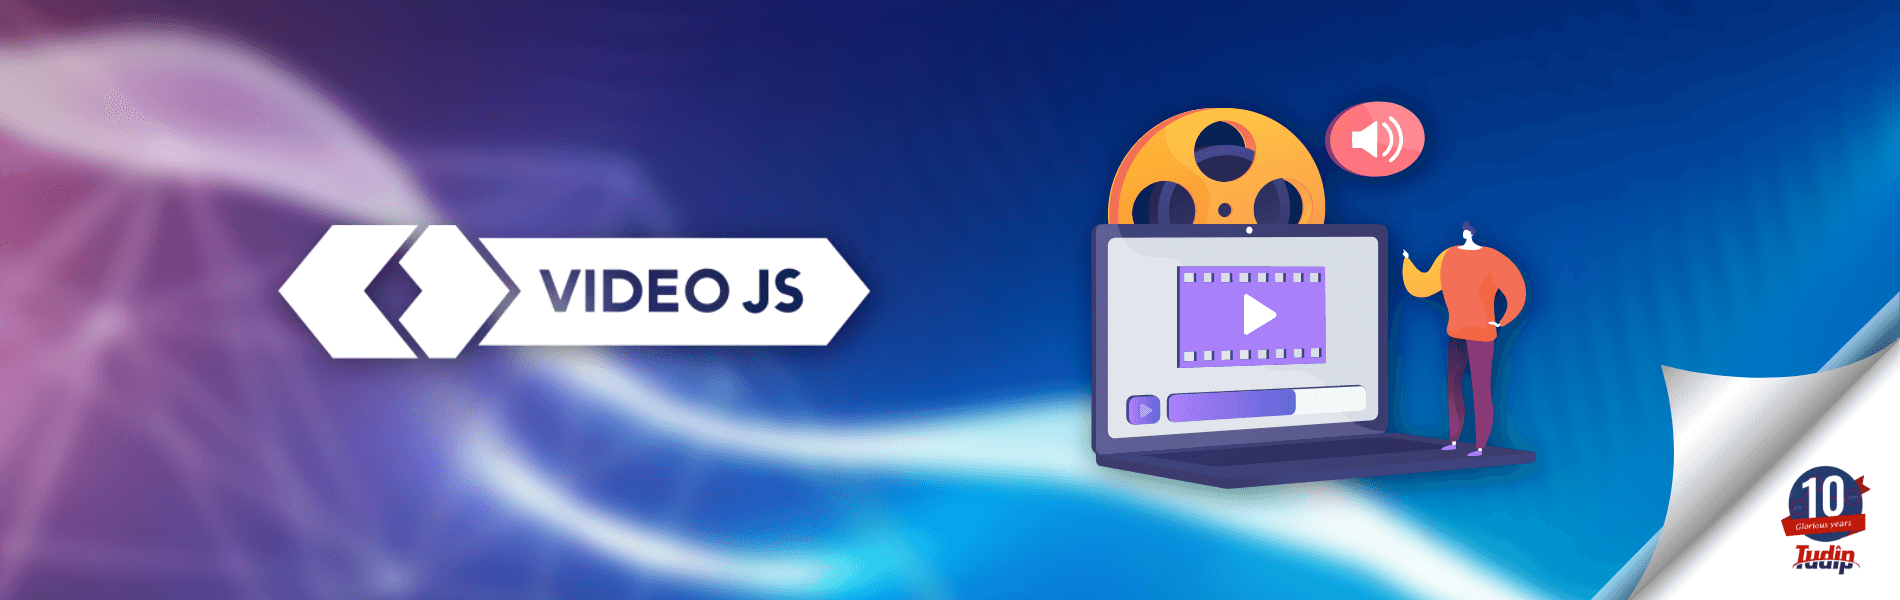 Basics of Video.js